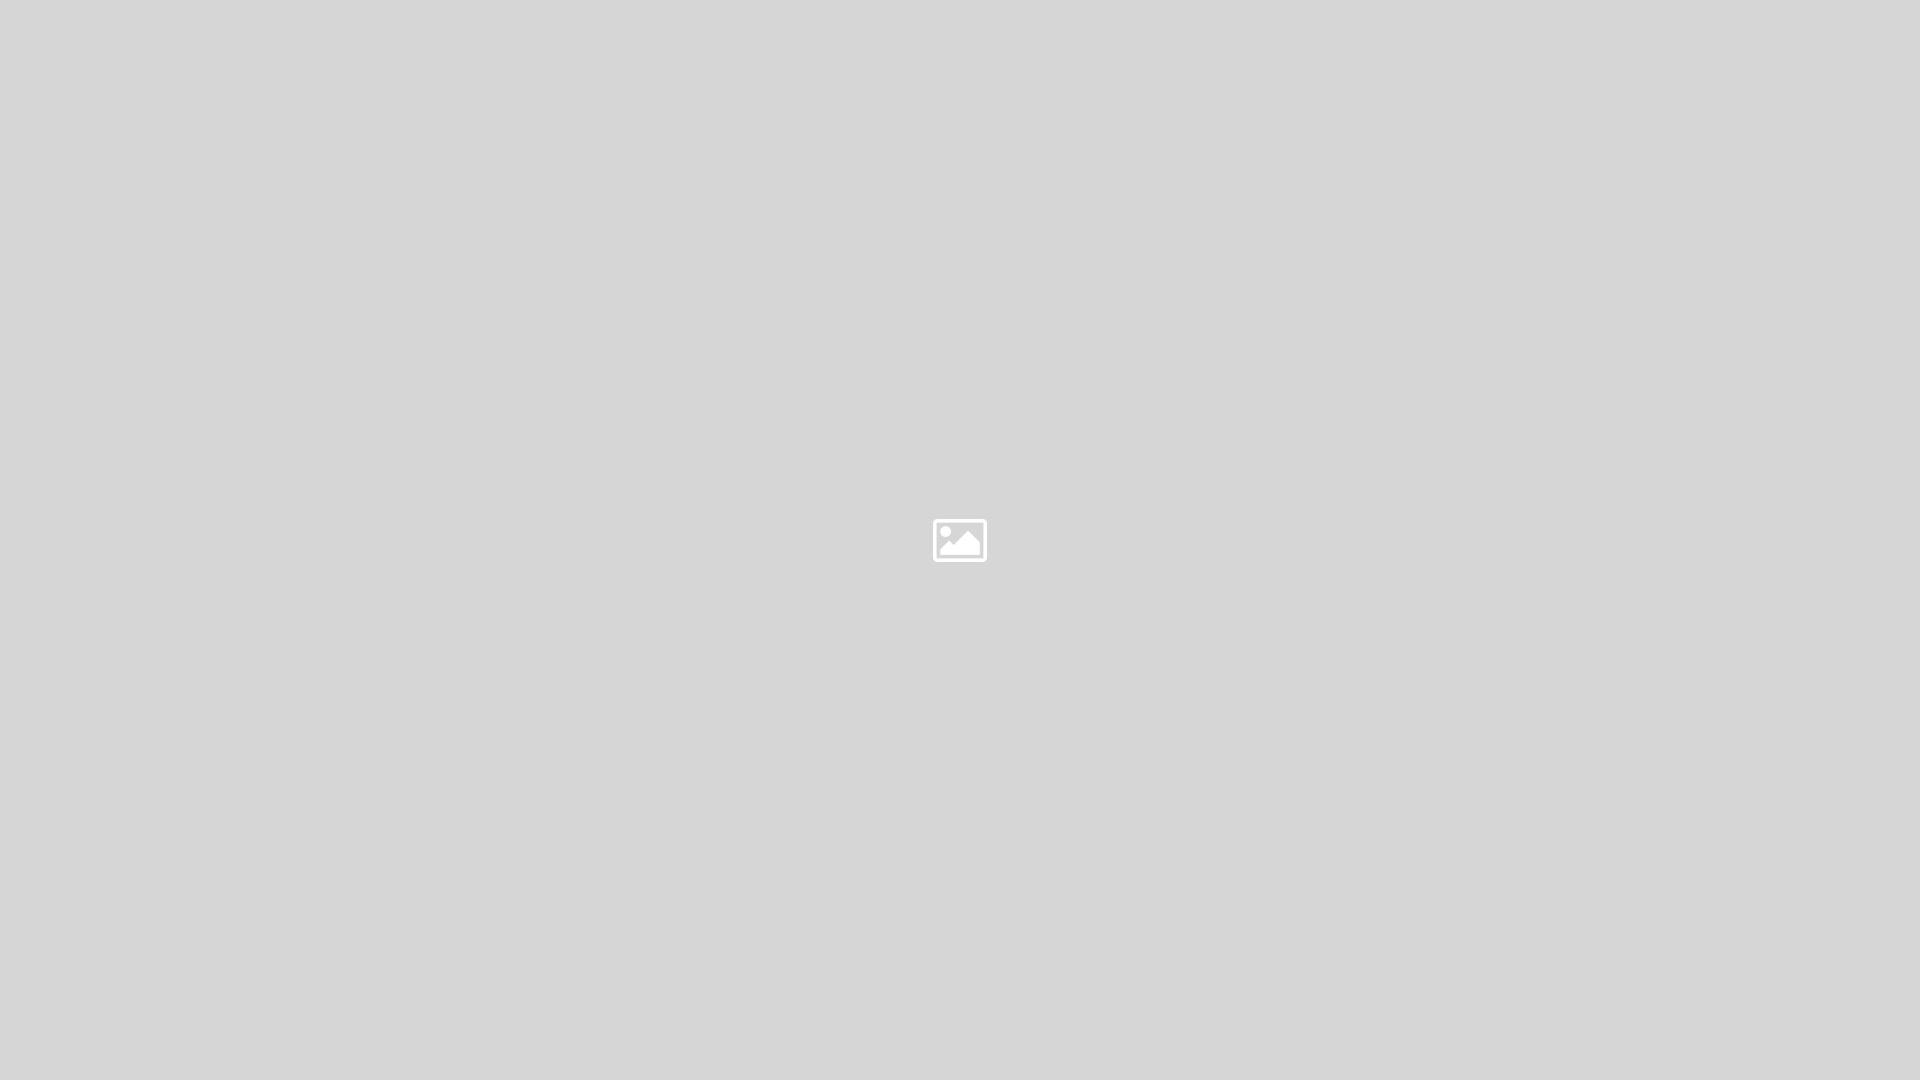 stationery-mockup-04